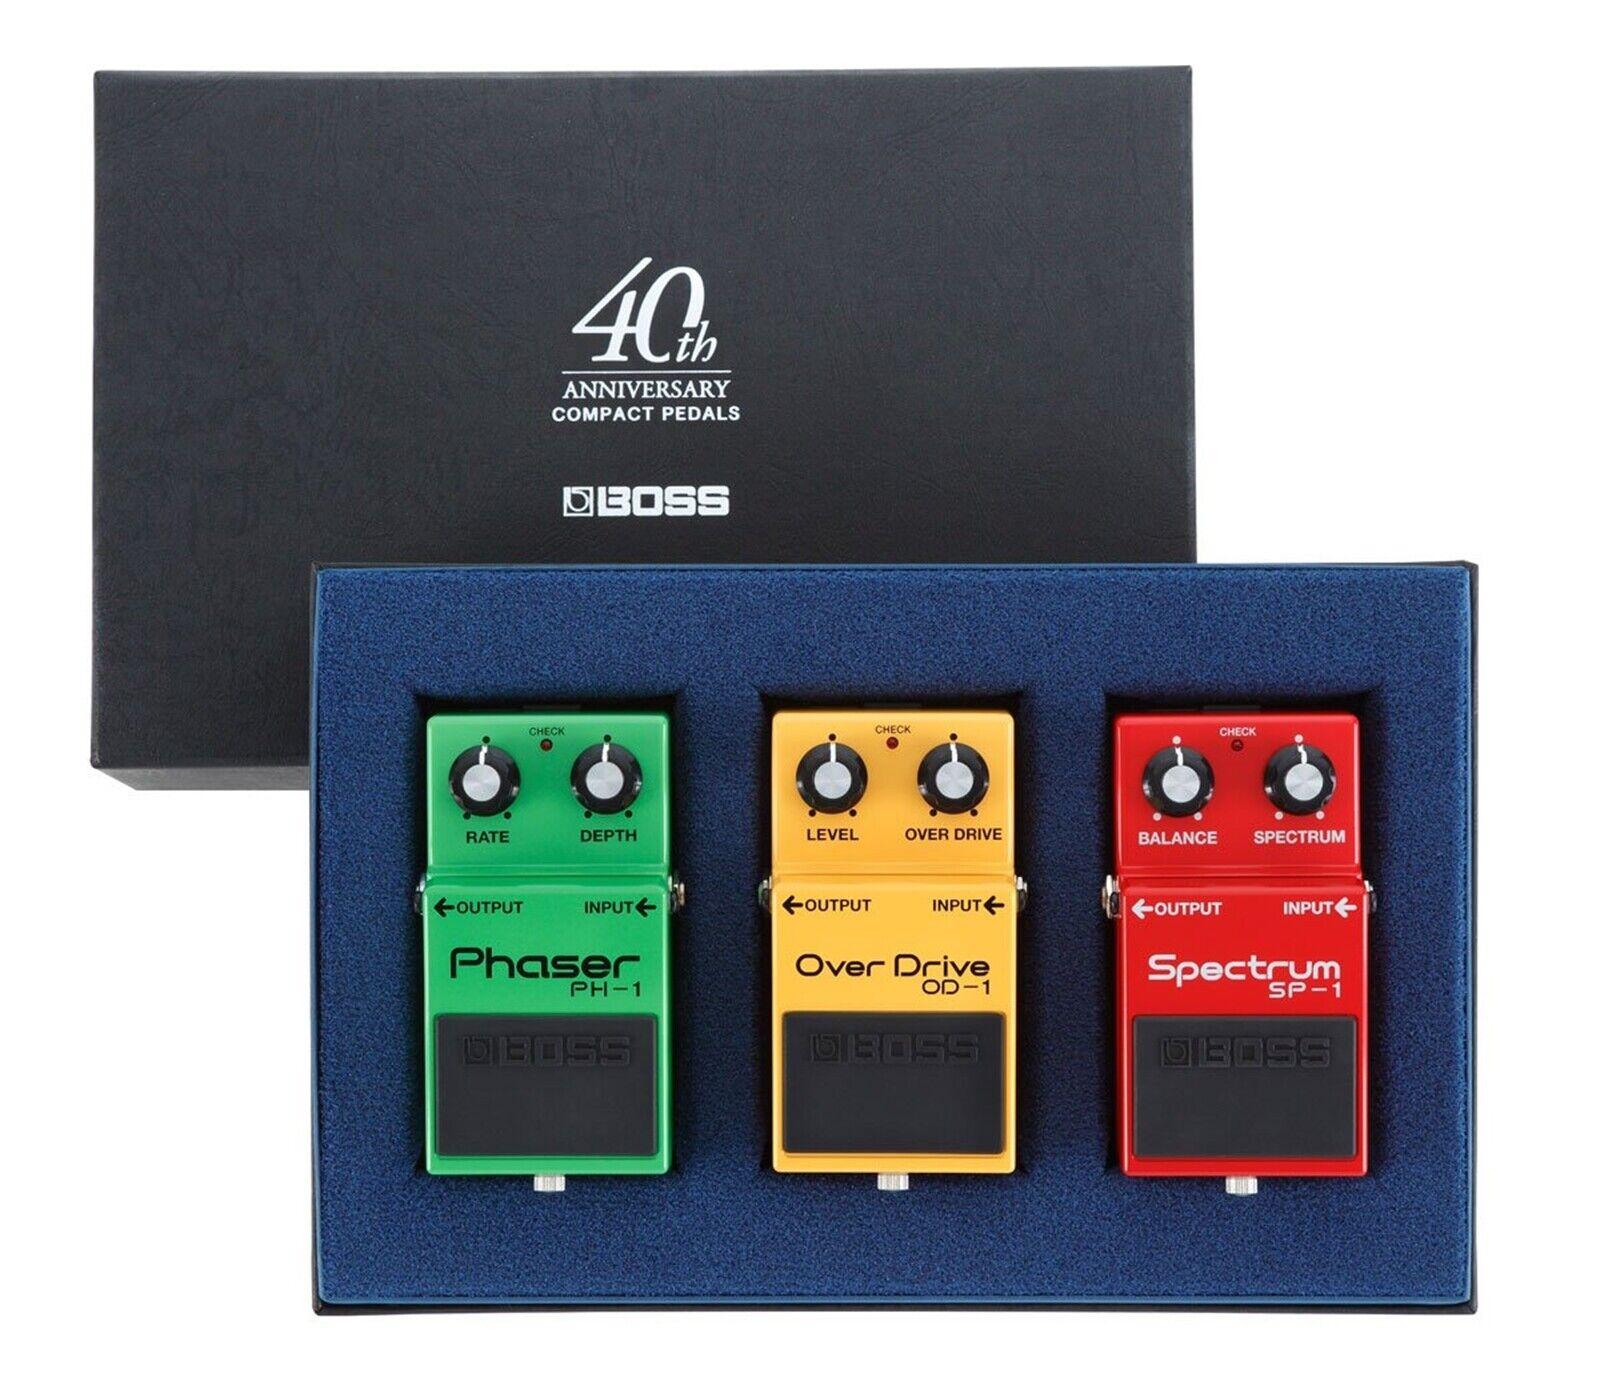 BOSS Box-40 Compact Guitar Effect Pedals 40th Anniversary Box PH-1 SP-1 OD-1 Set